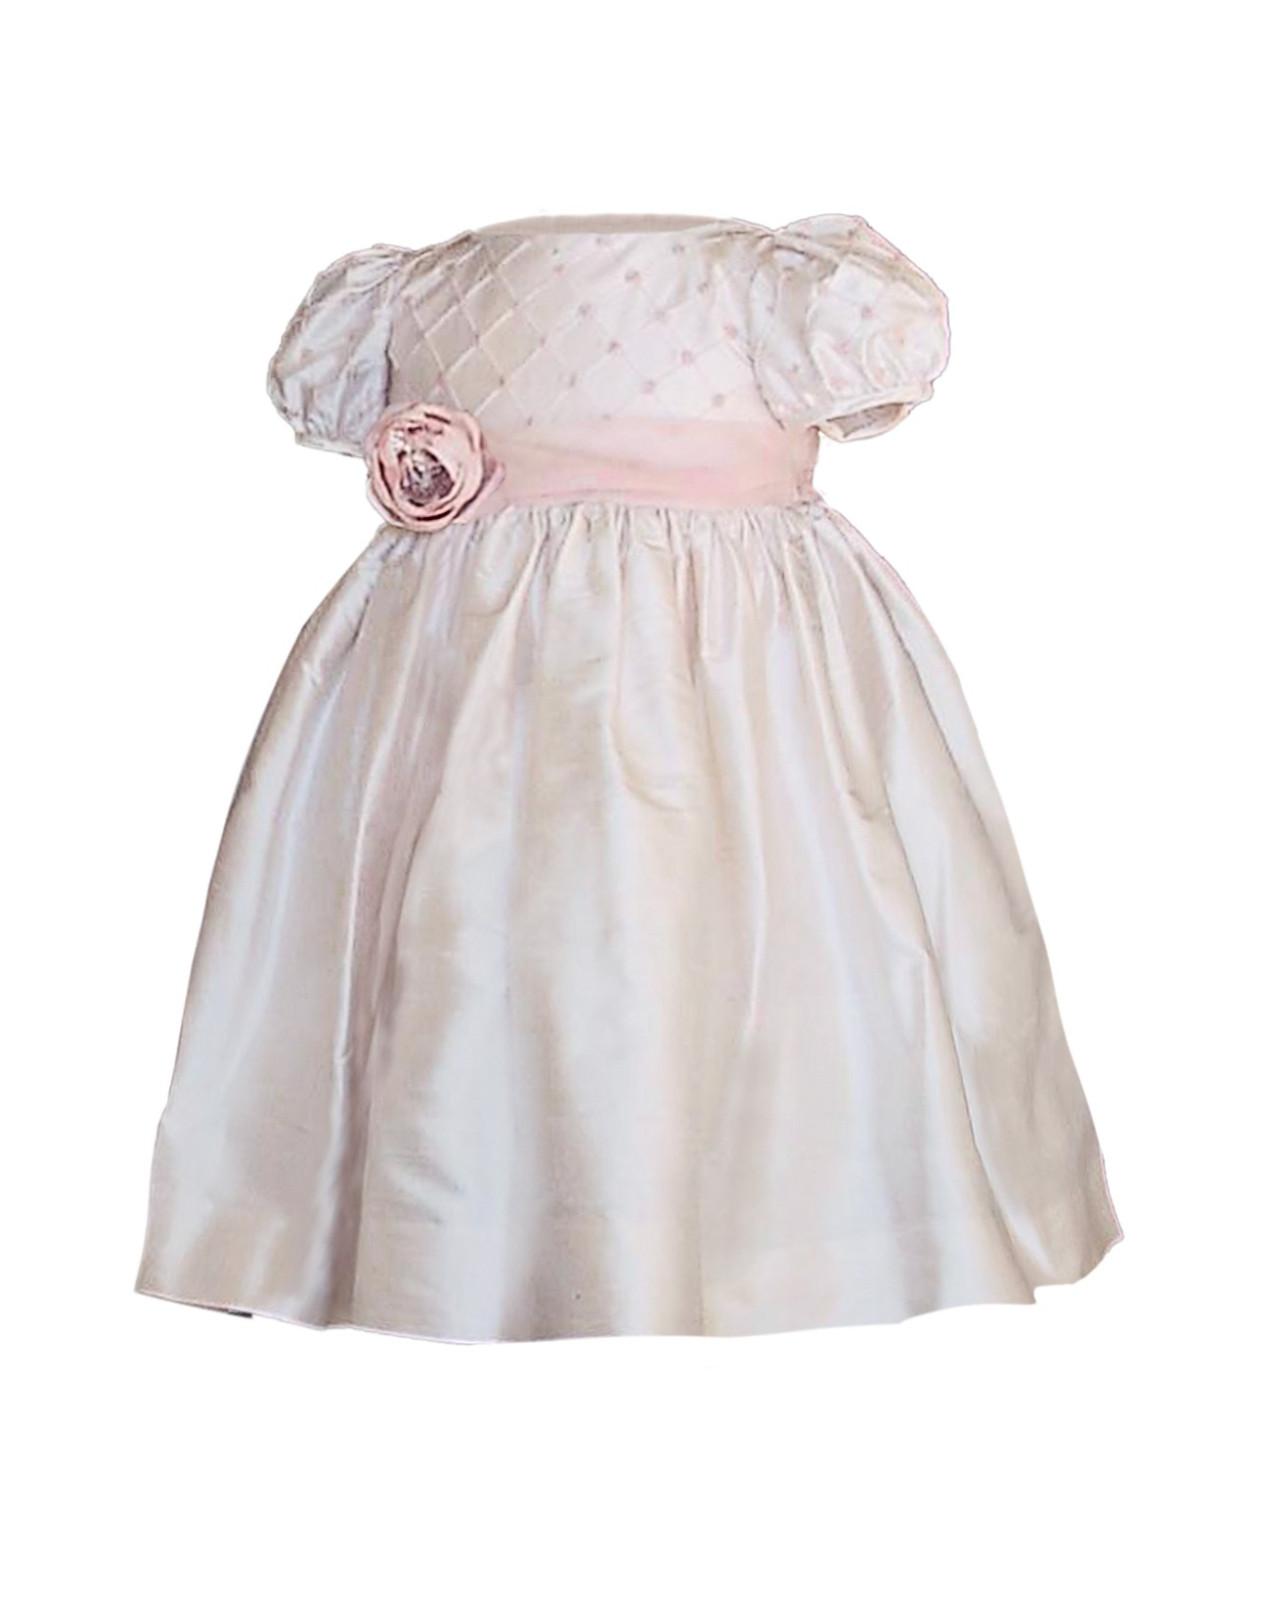 Iolanda special occasion silk girl dress